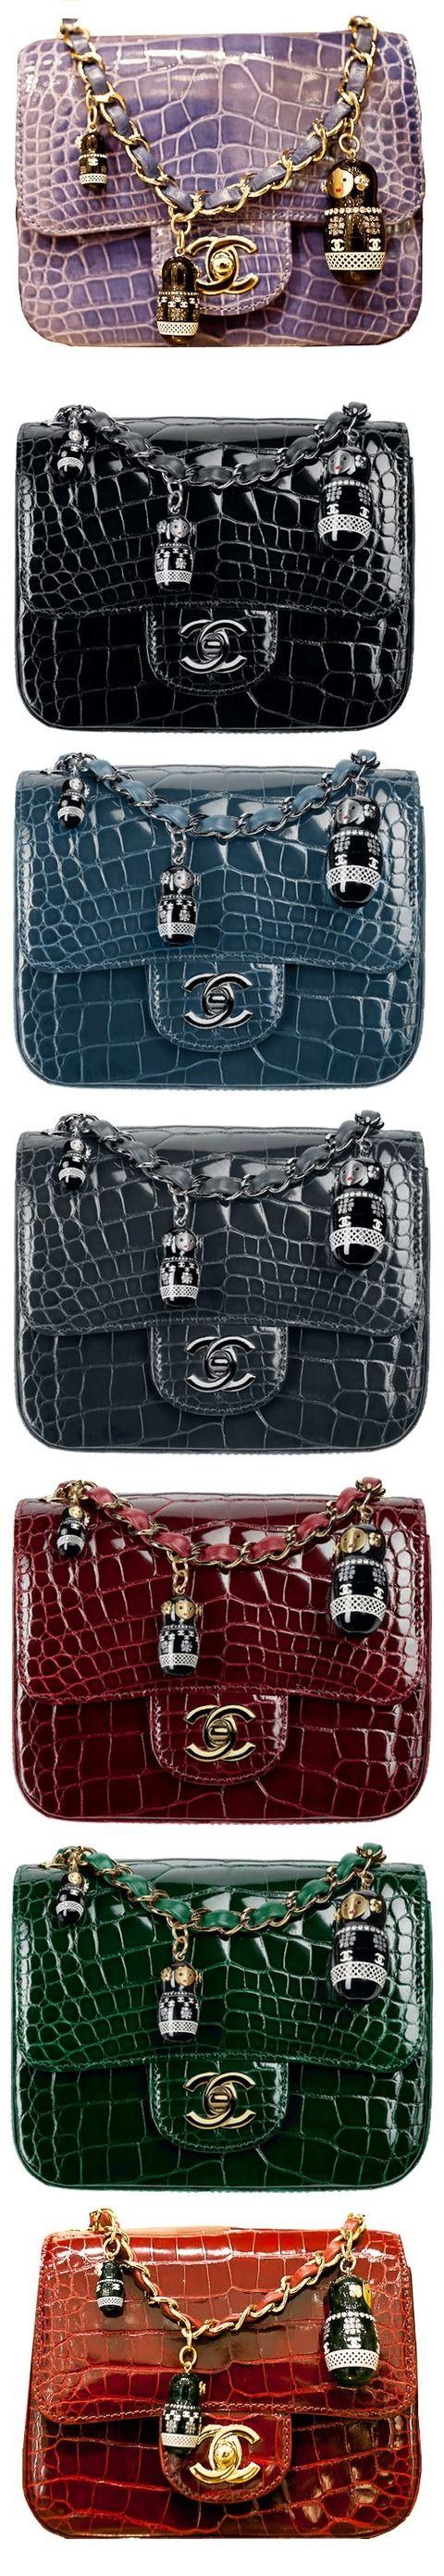 Chanel Exoctic Matriochka Flap Bag §